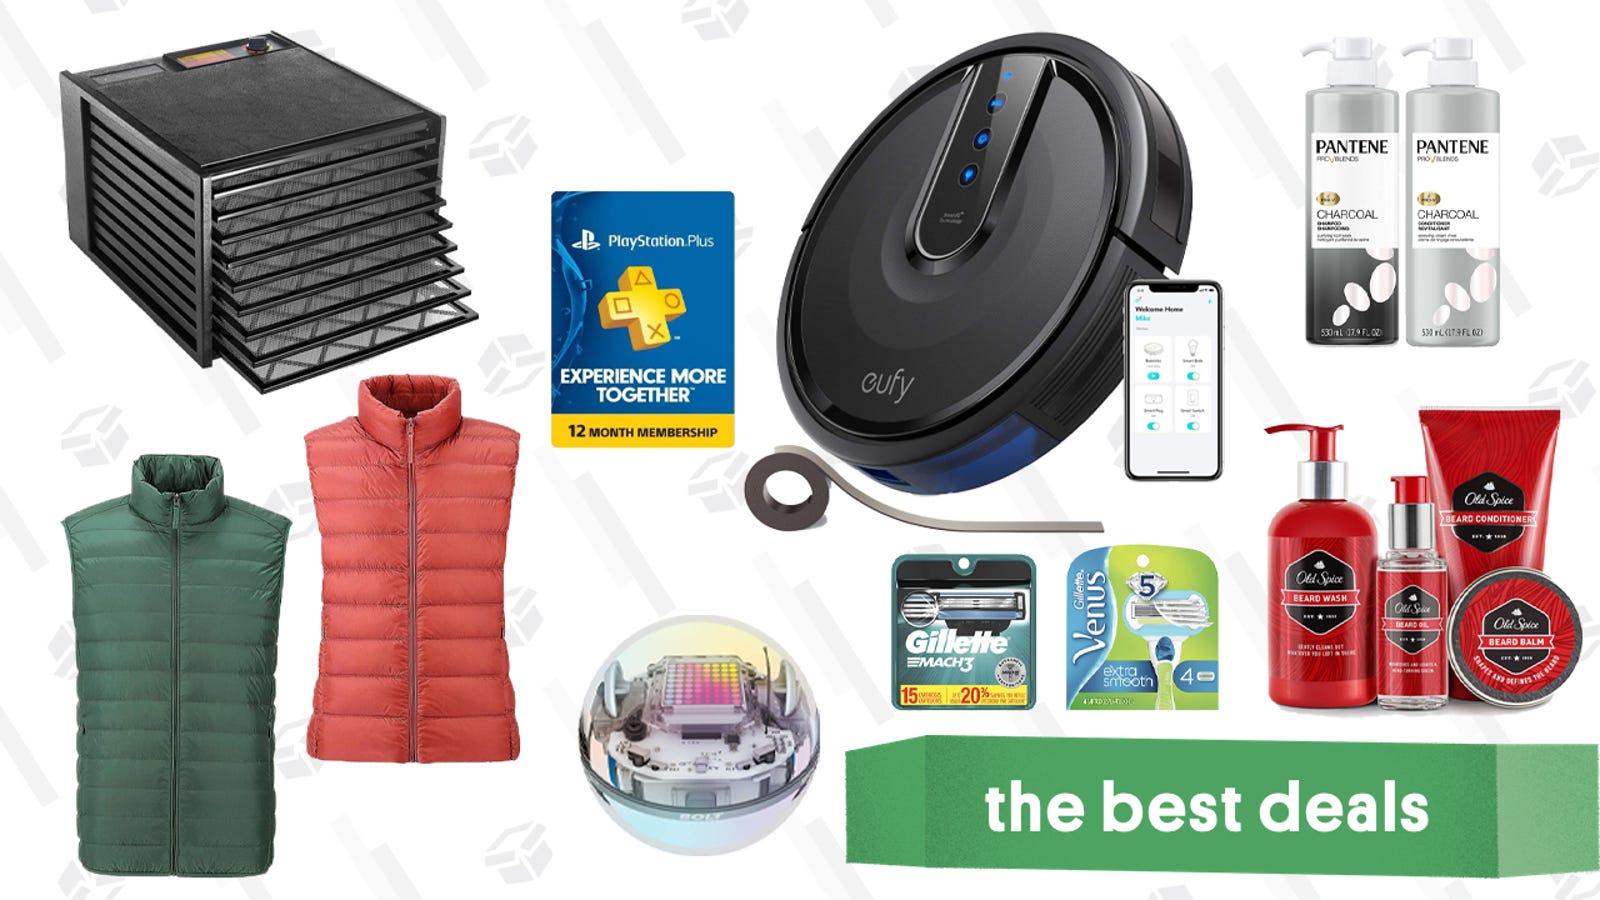 Monday's Best Deals: Uniqlo Vests, PlayStation Plus, Eufy RoboVacs, Sphero, and More